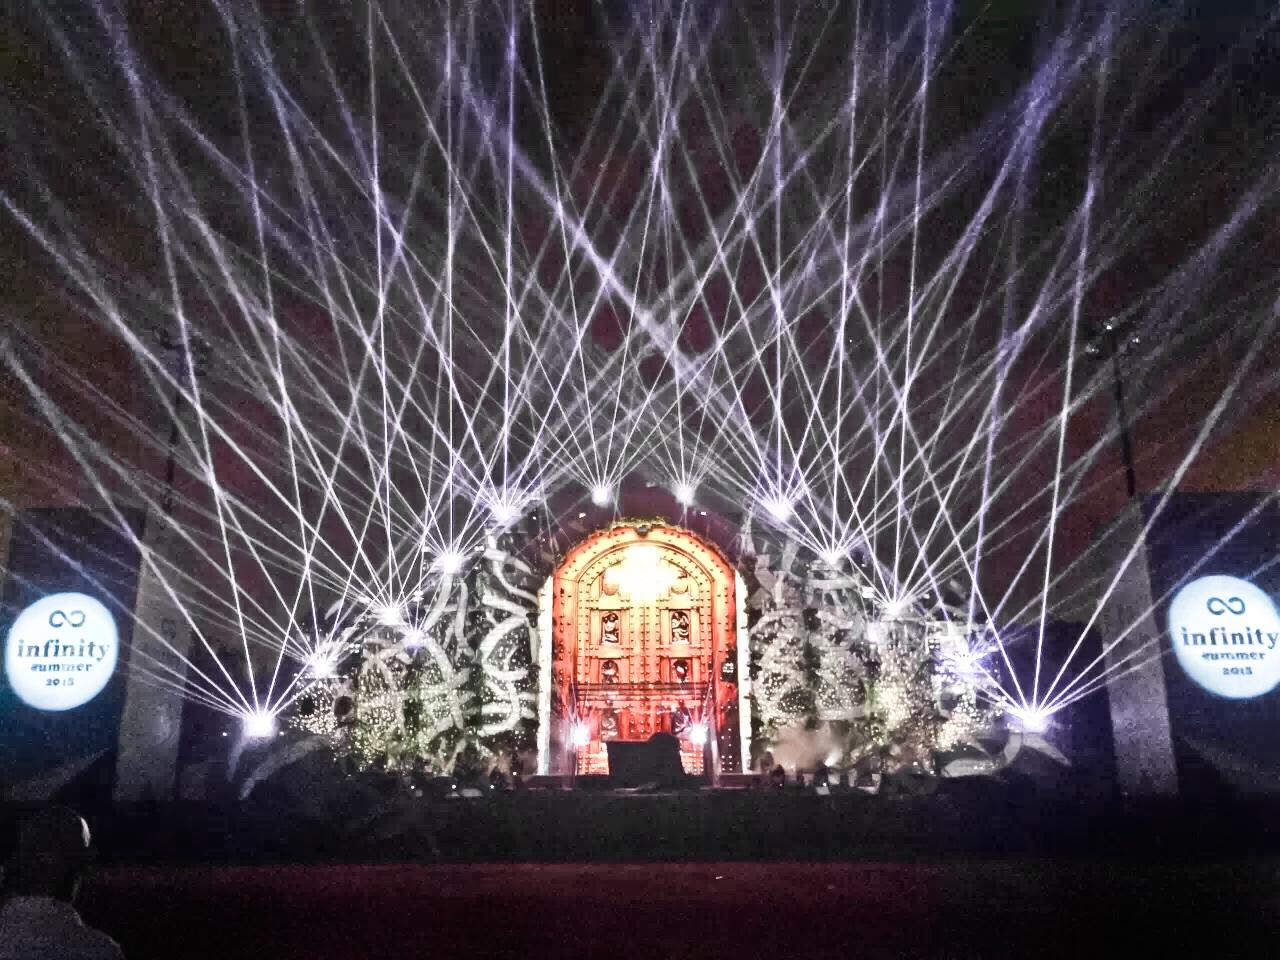 Infinity Festival Shanghai 2015 0001